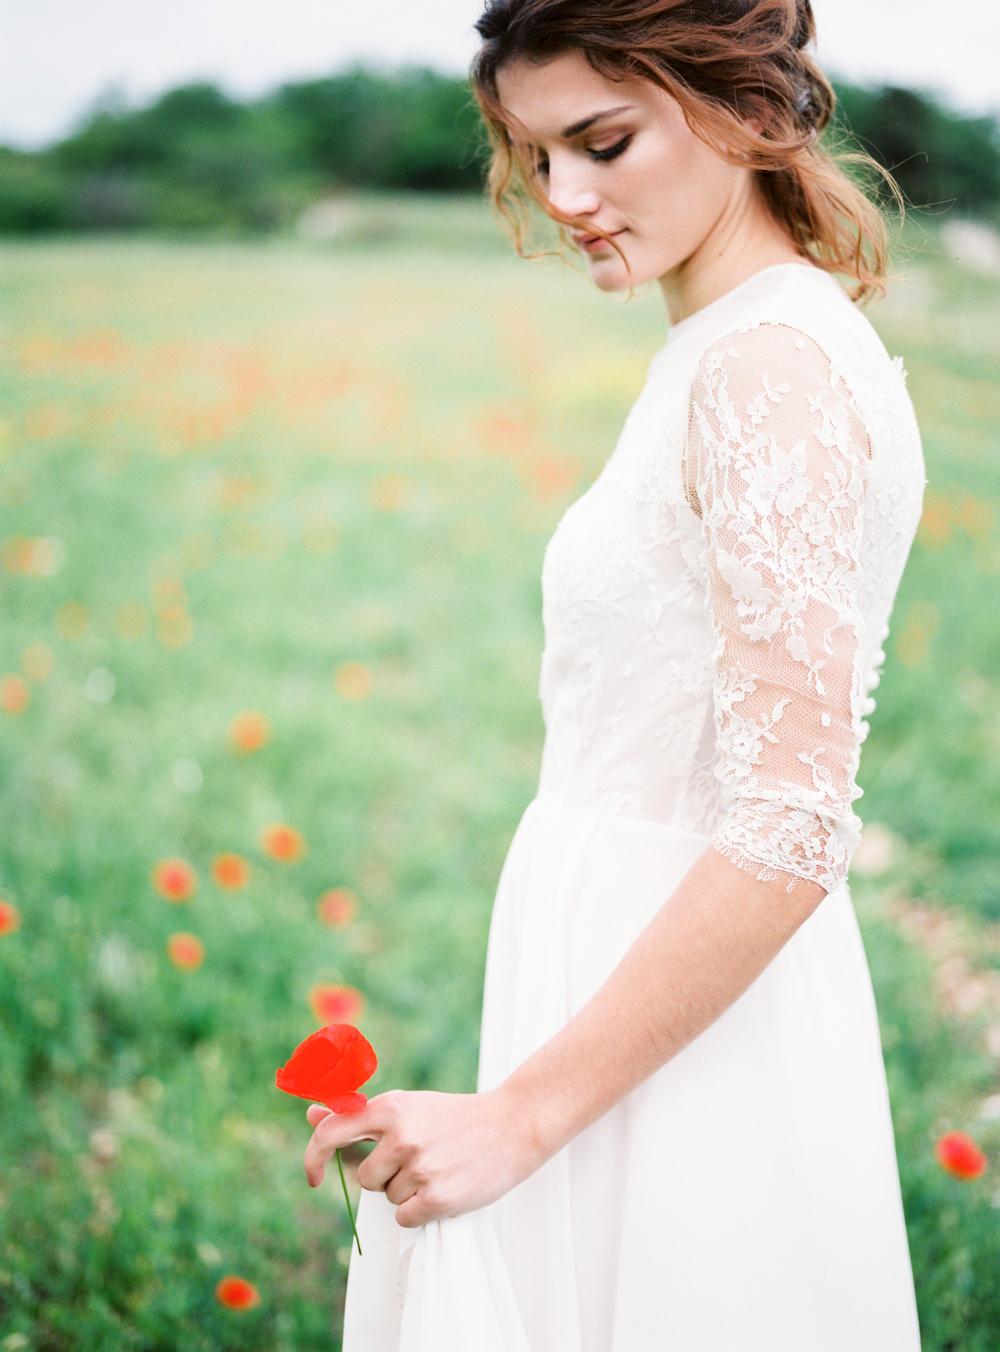 celine_chhuon_photography_Provence_Bride120.jpg